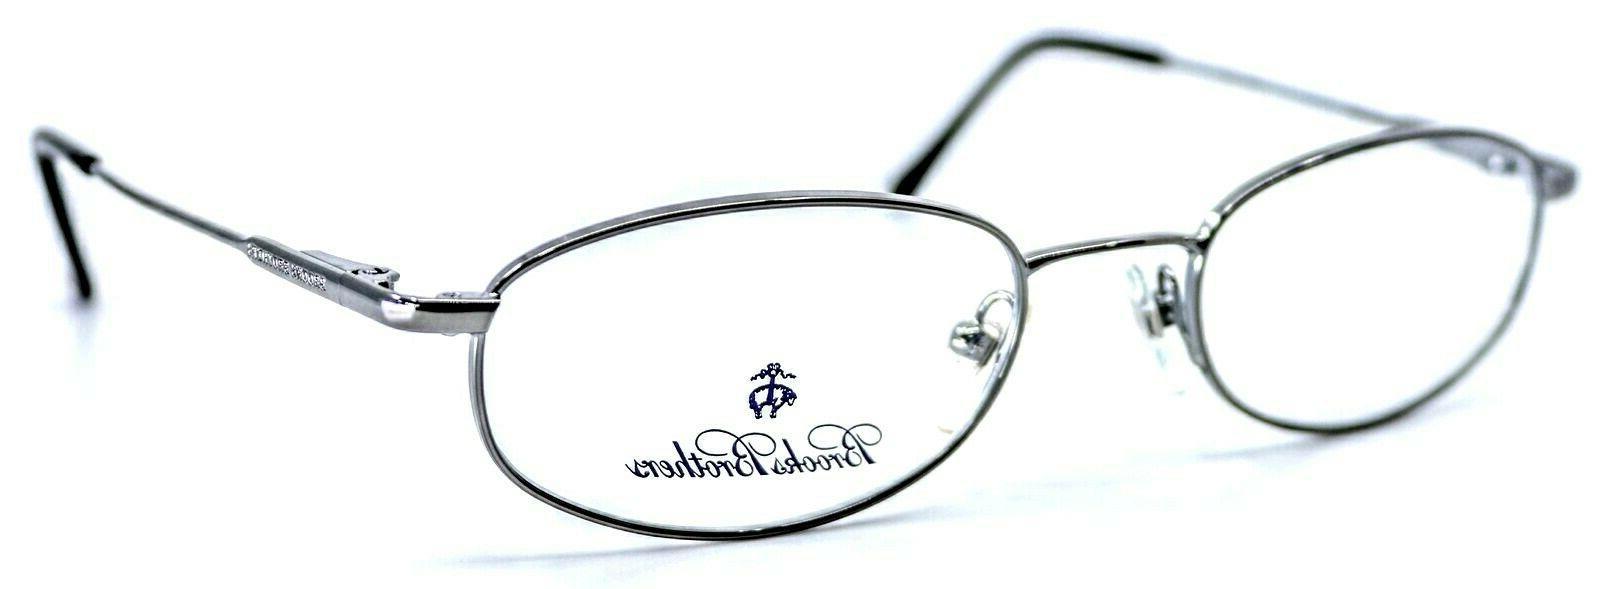 bb491 1150 gunmetal oval eyeglass frames 49